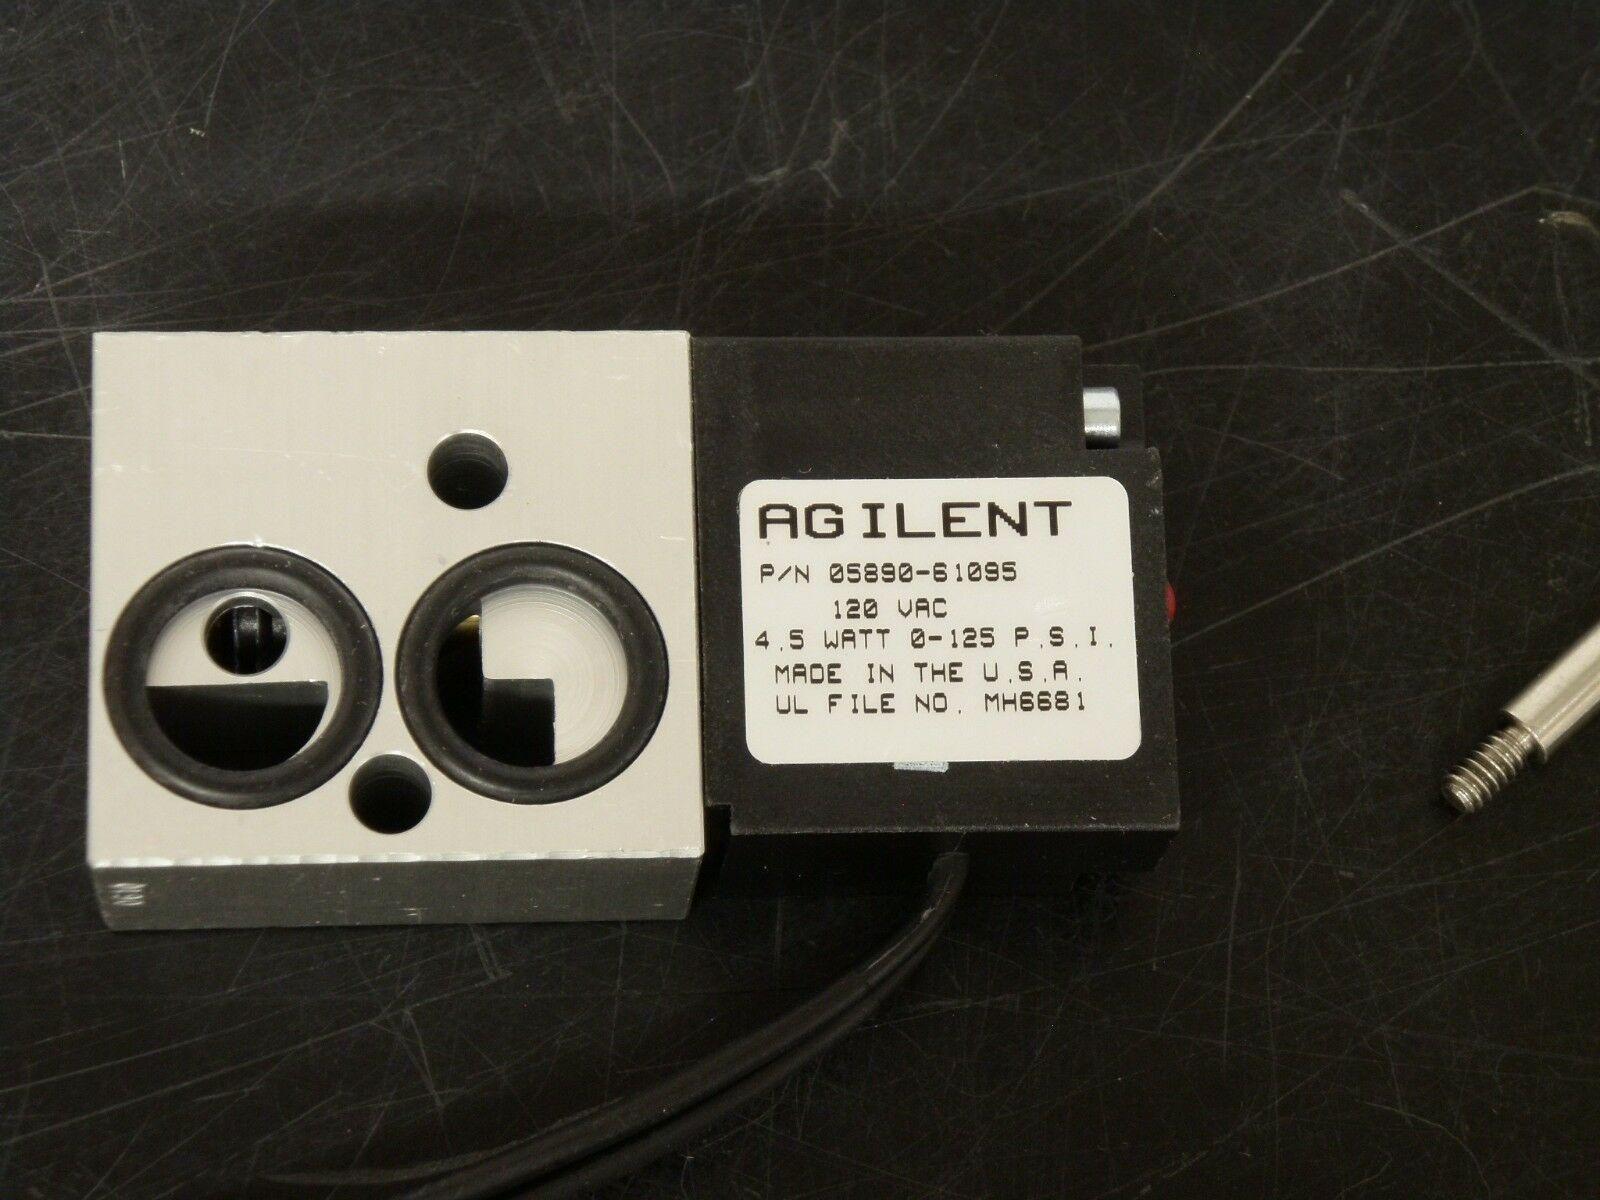 Agilent  Four-way Solenoid Valve, 115 V AC, PN: 05890-61095